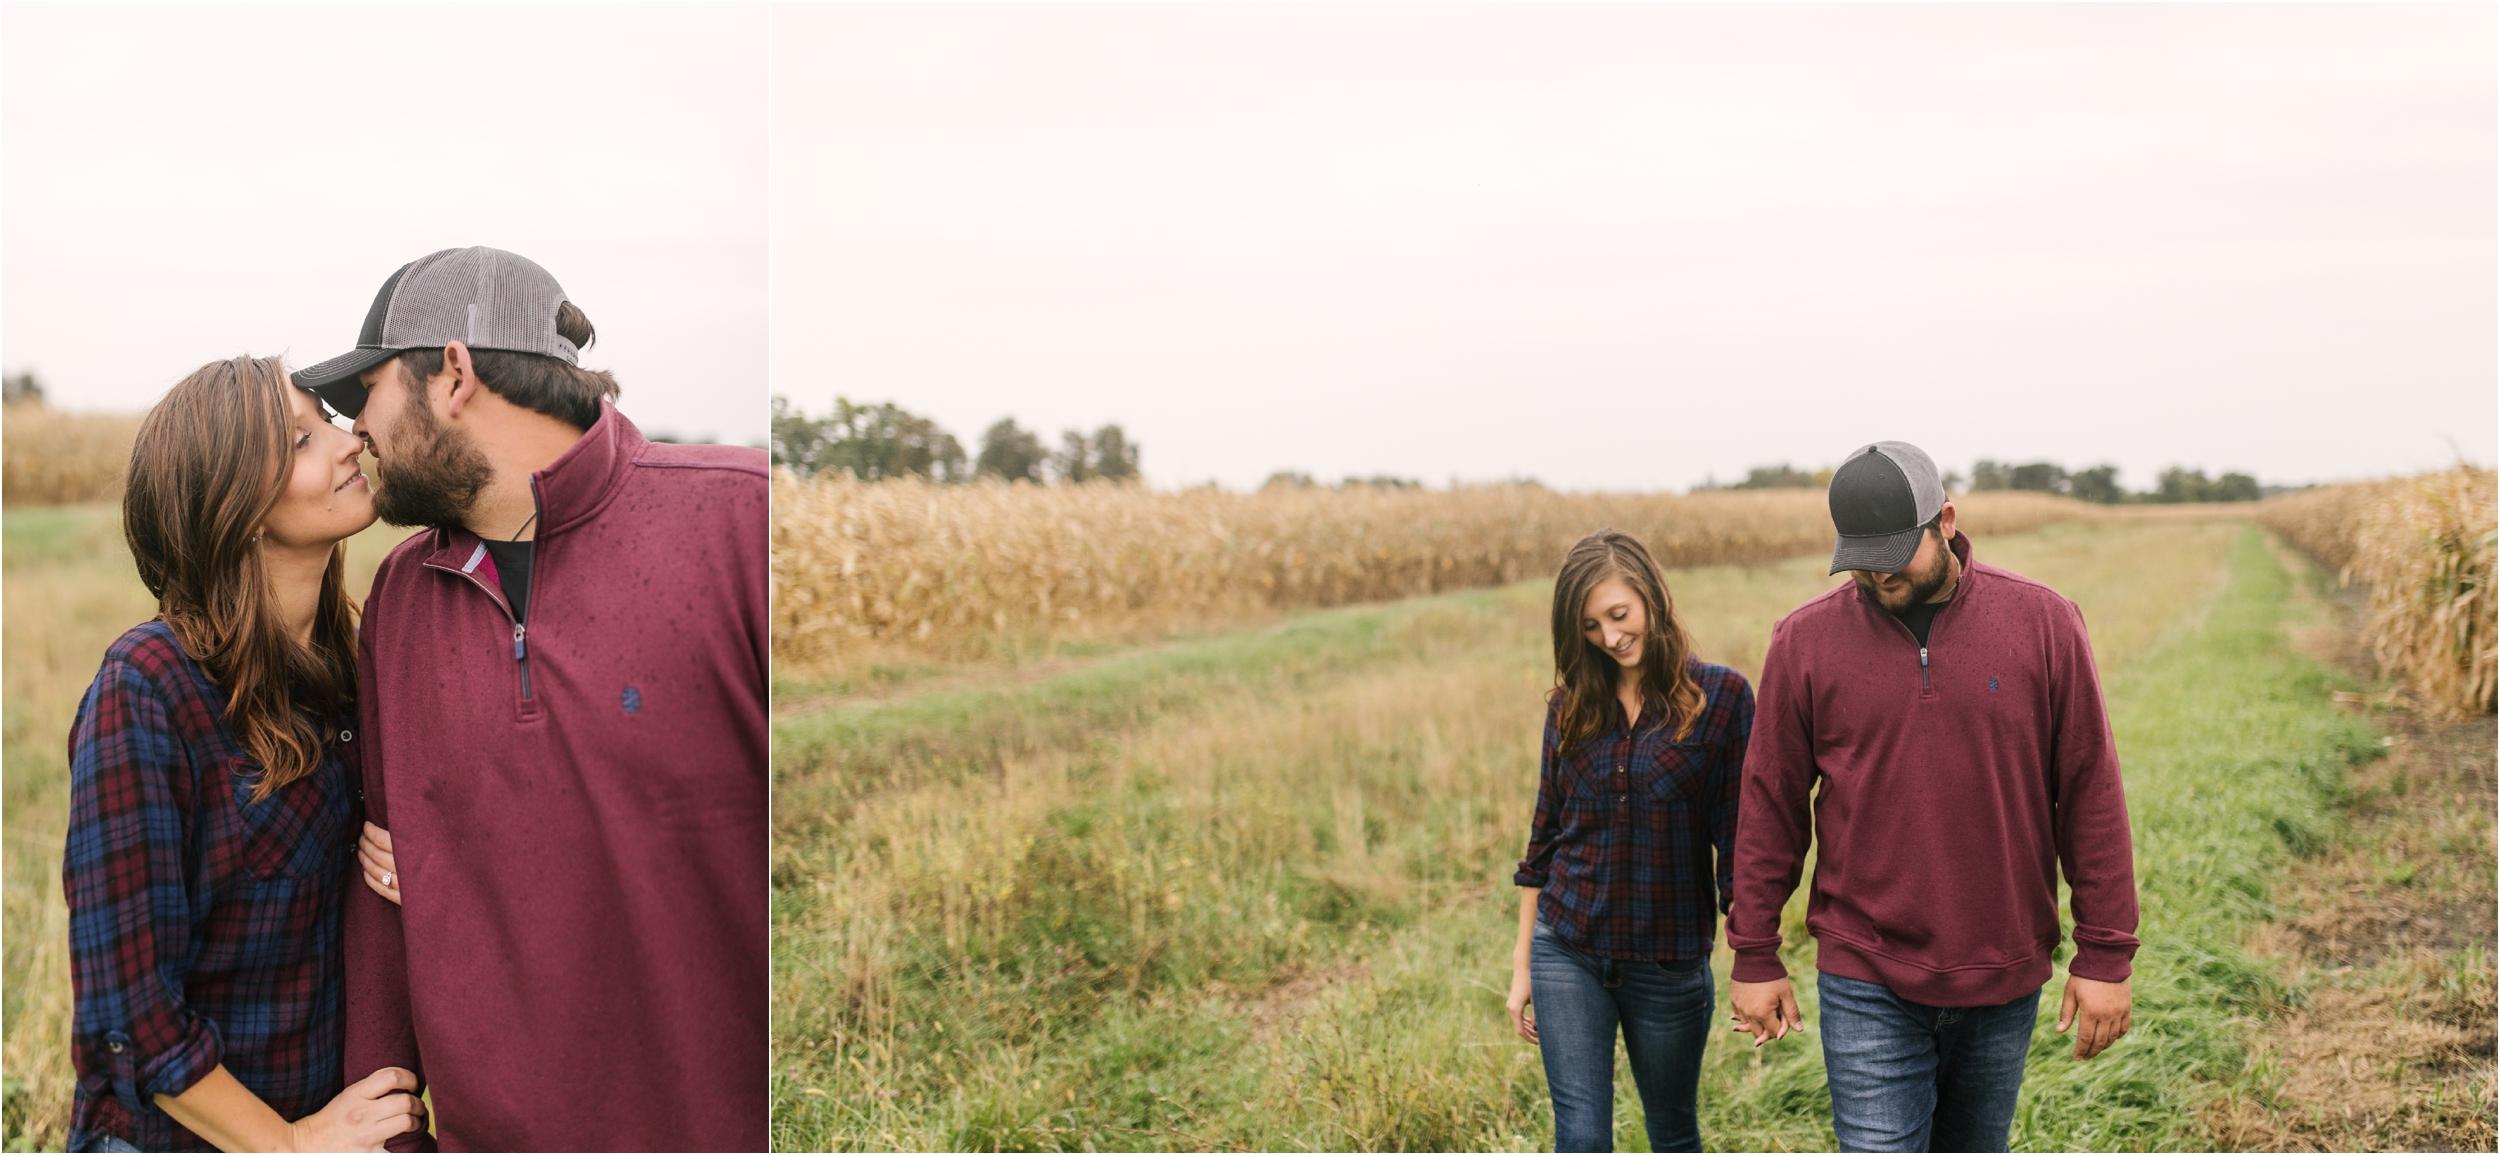 Countryside Engagement Photos_ Minnesota Wedding Photographer_Stephanie Lynn Photography_0068.jpg